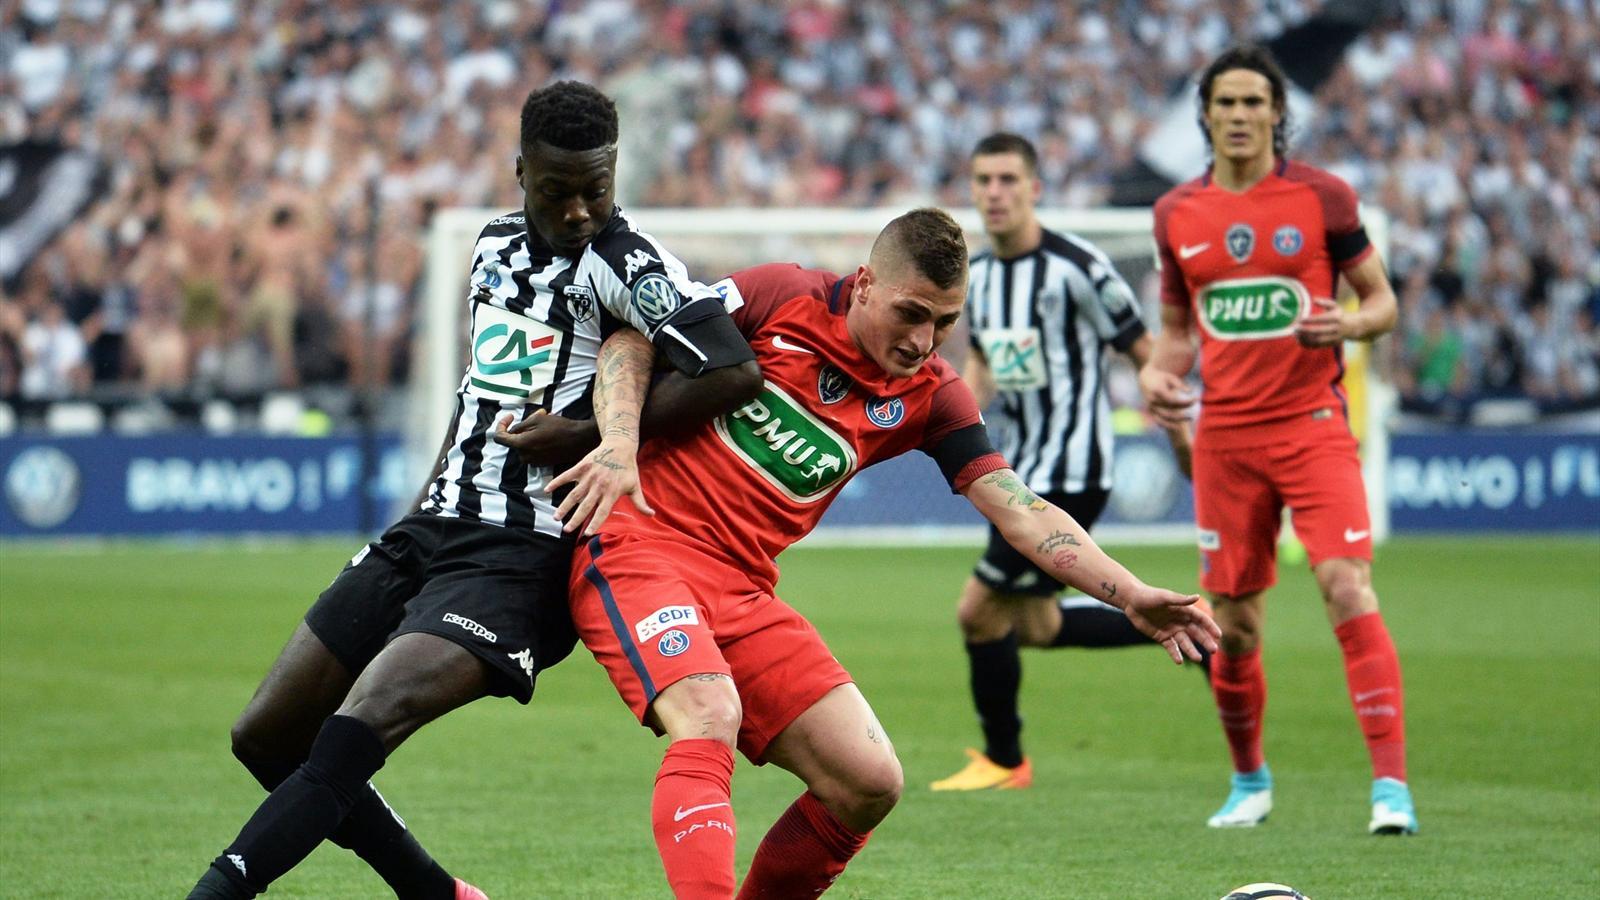 En direct live angers psg coupe de france 27 mai 2017 eurosport - Coupe de france football calendrier ...